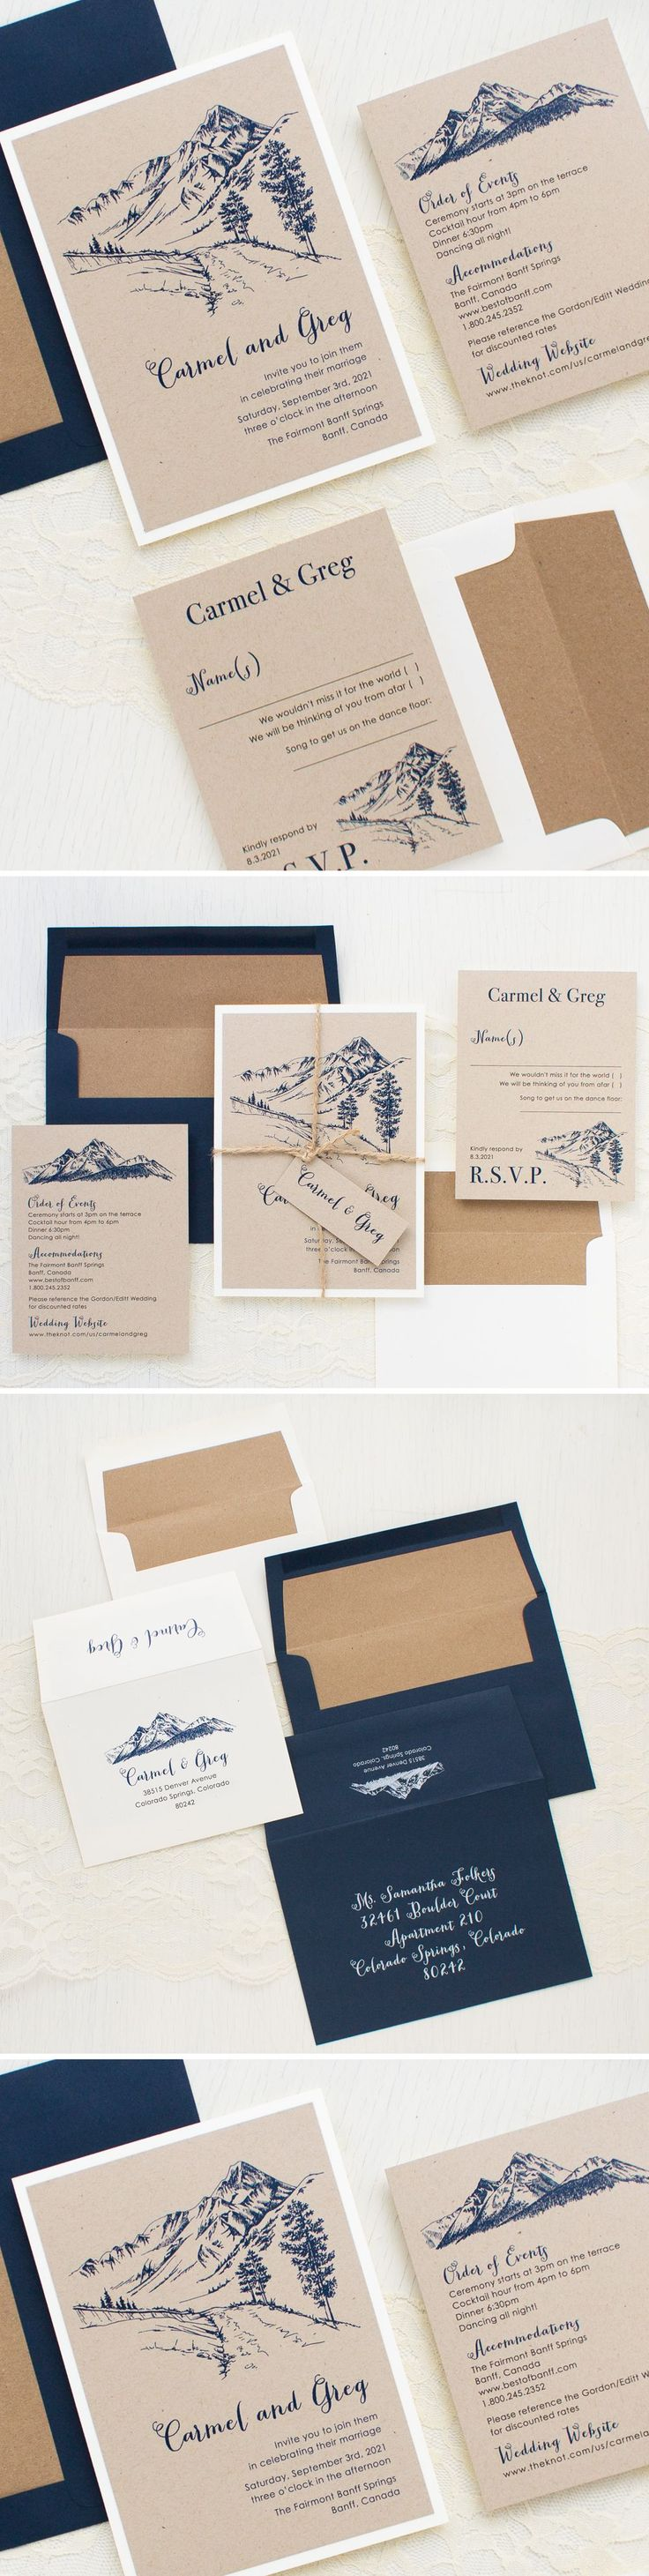 1234 best Wedding Invitations images on Pinterest | Invitations ...